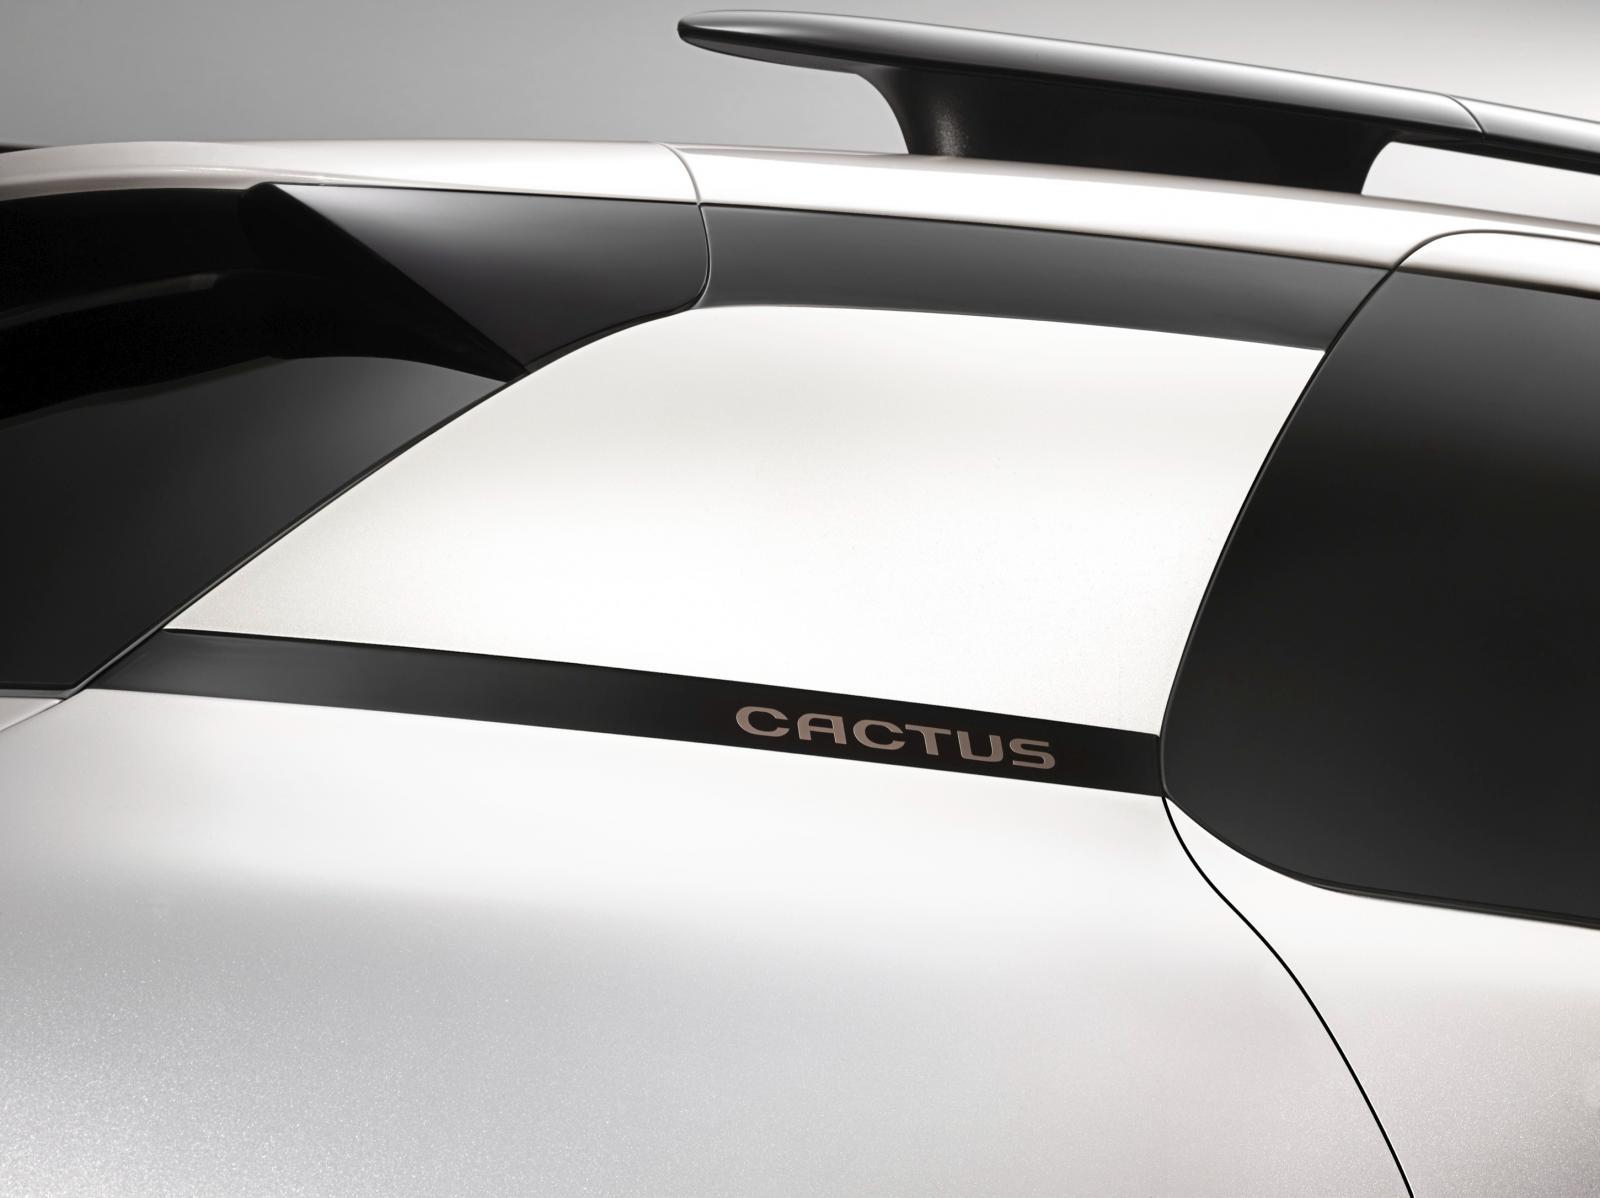 C4 Cactus Shine edition 2014 logo de custode